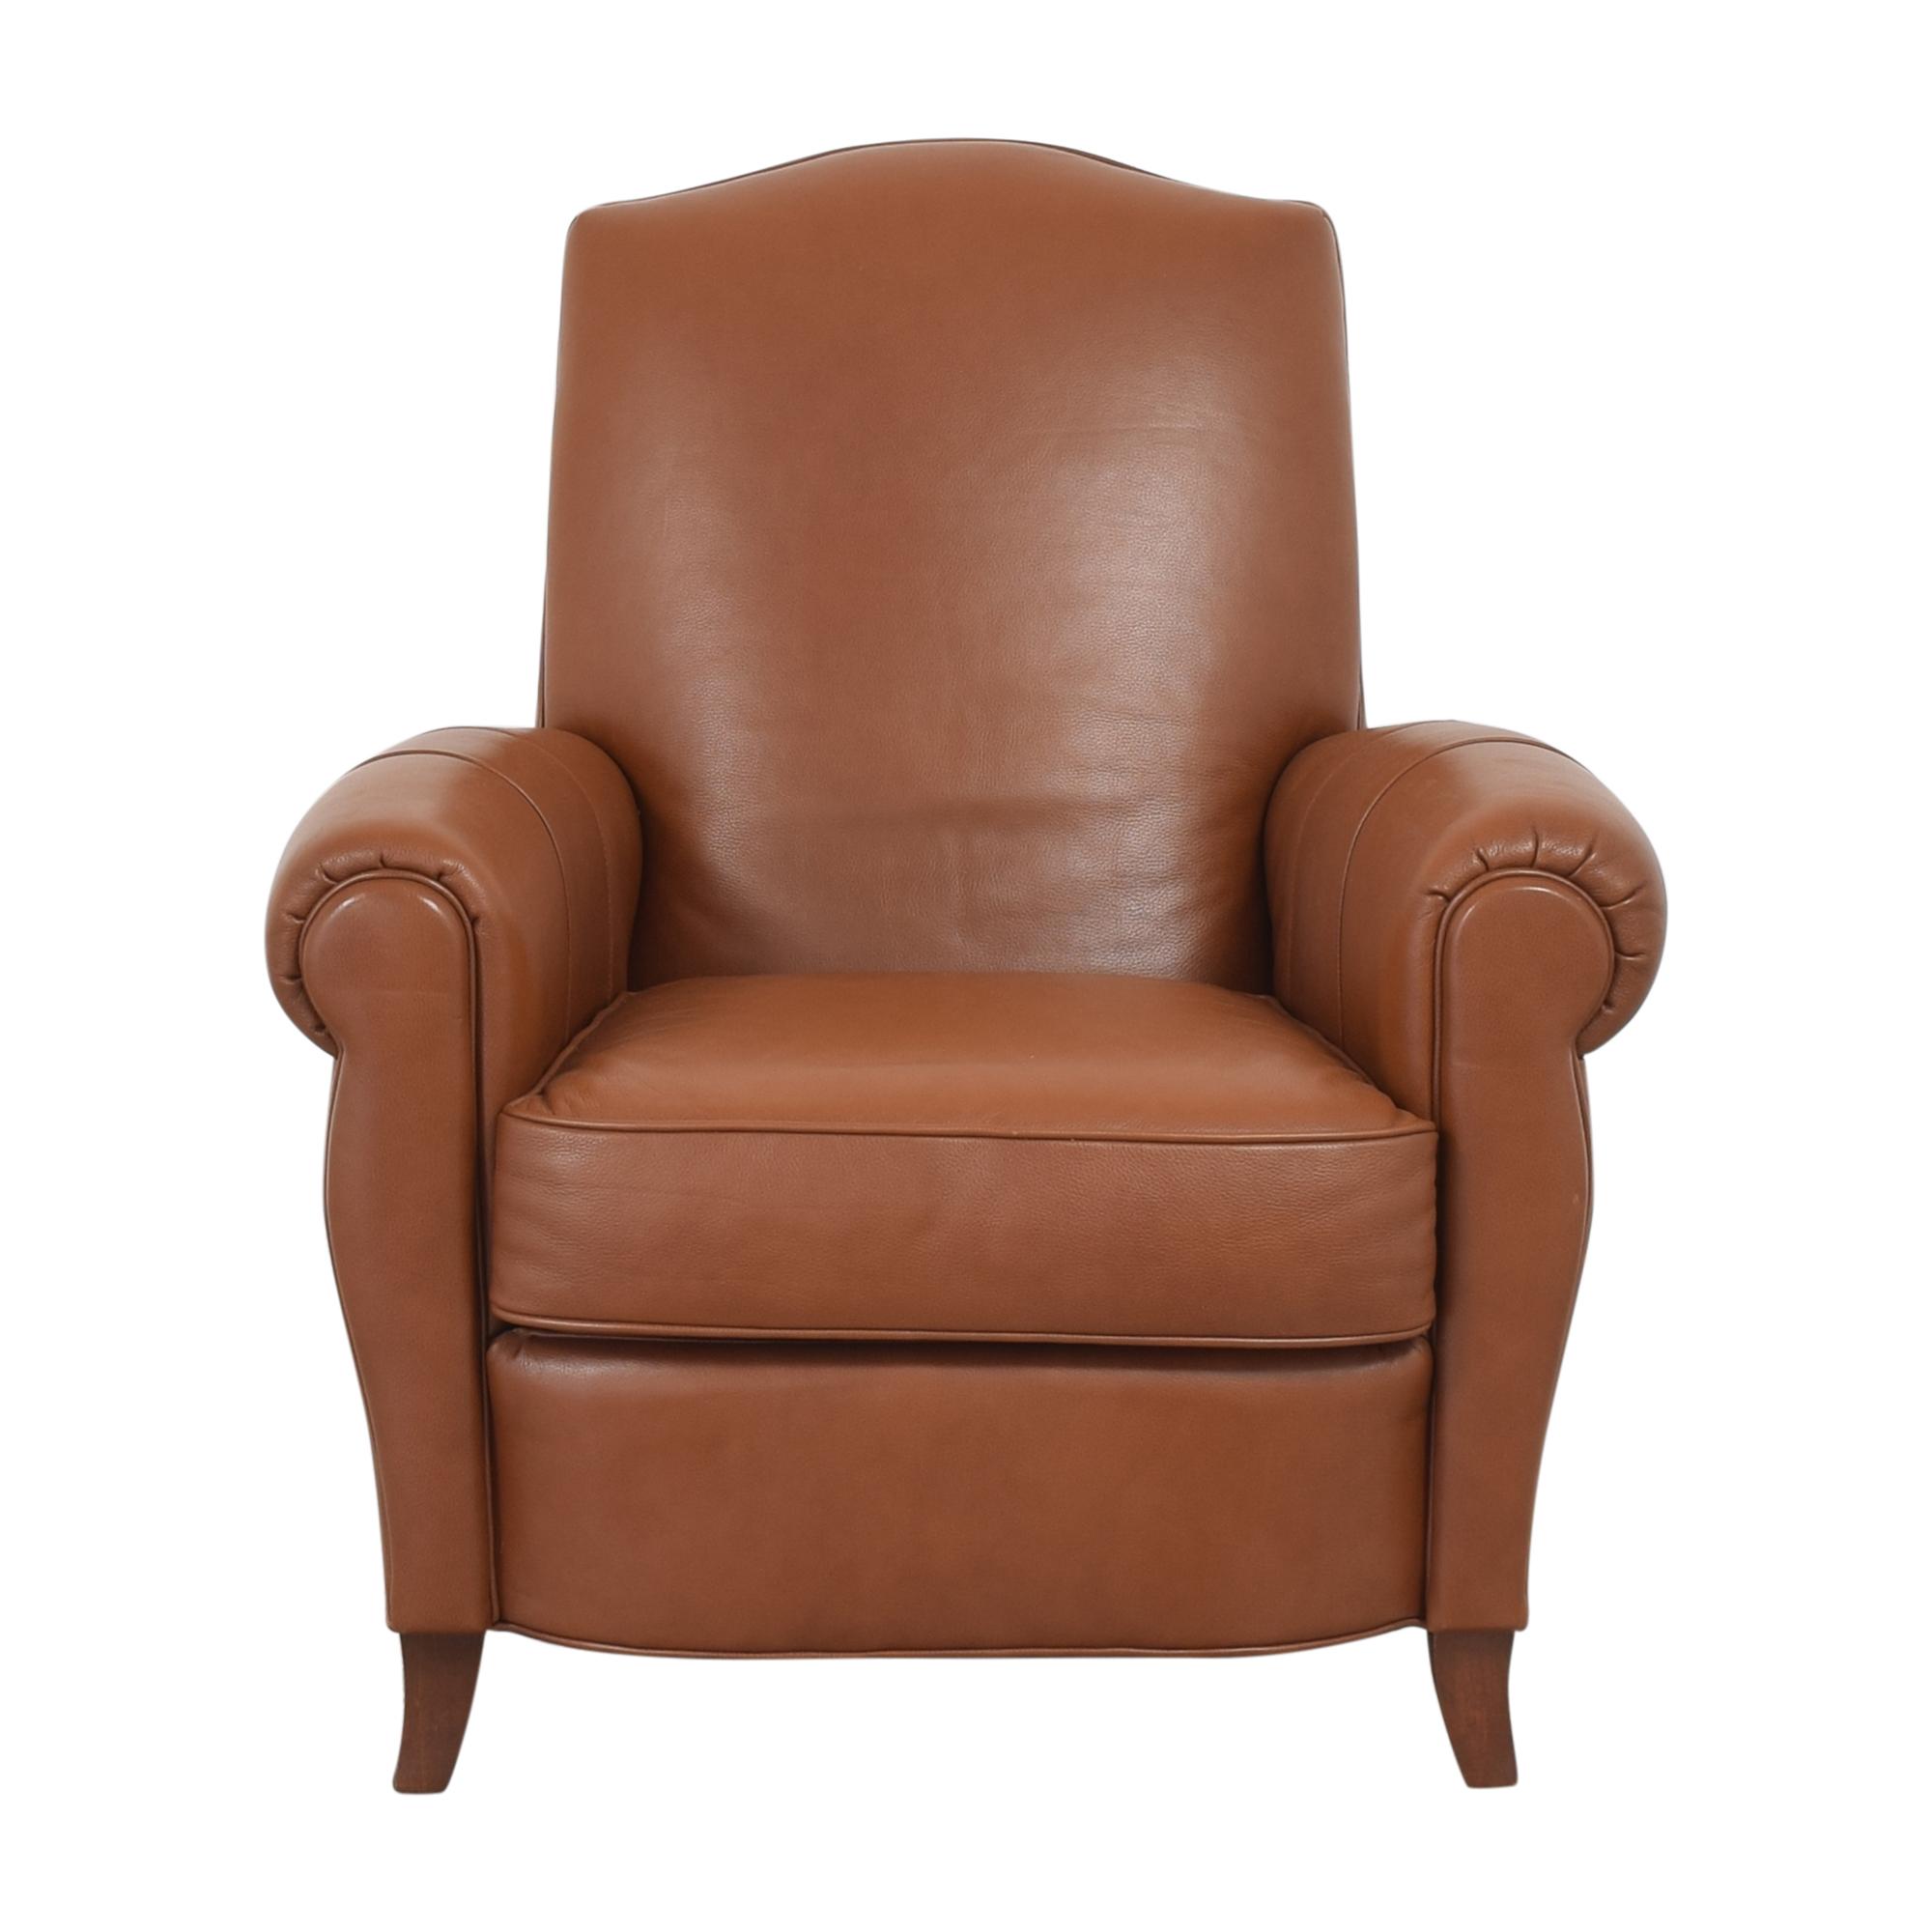 Ethan Allen Ethan Allen Roll Arm Chair with Ottoman ct